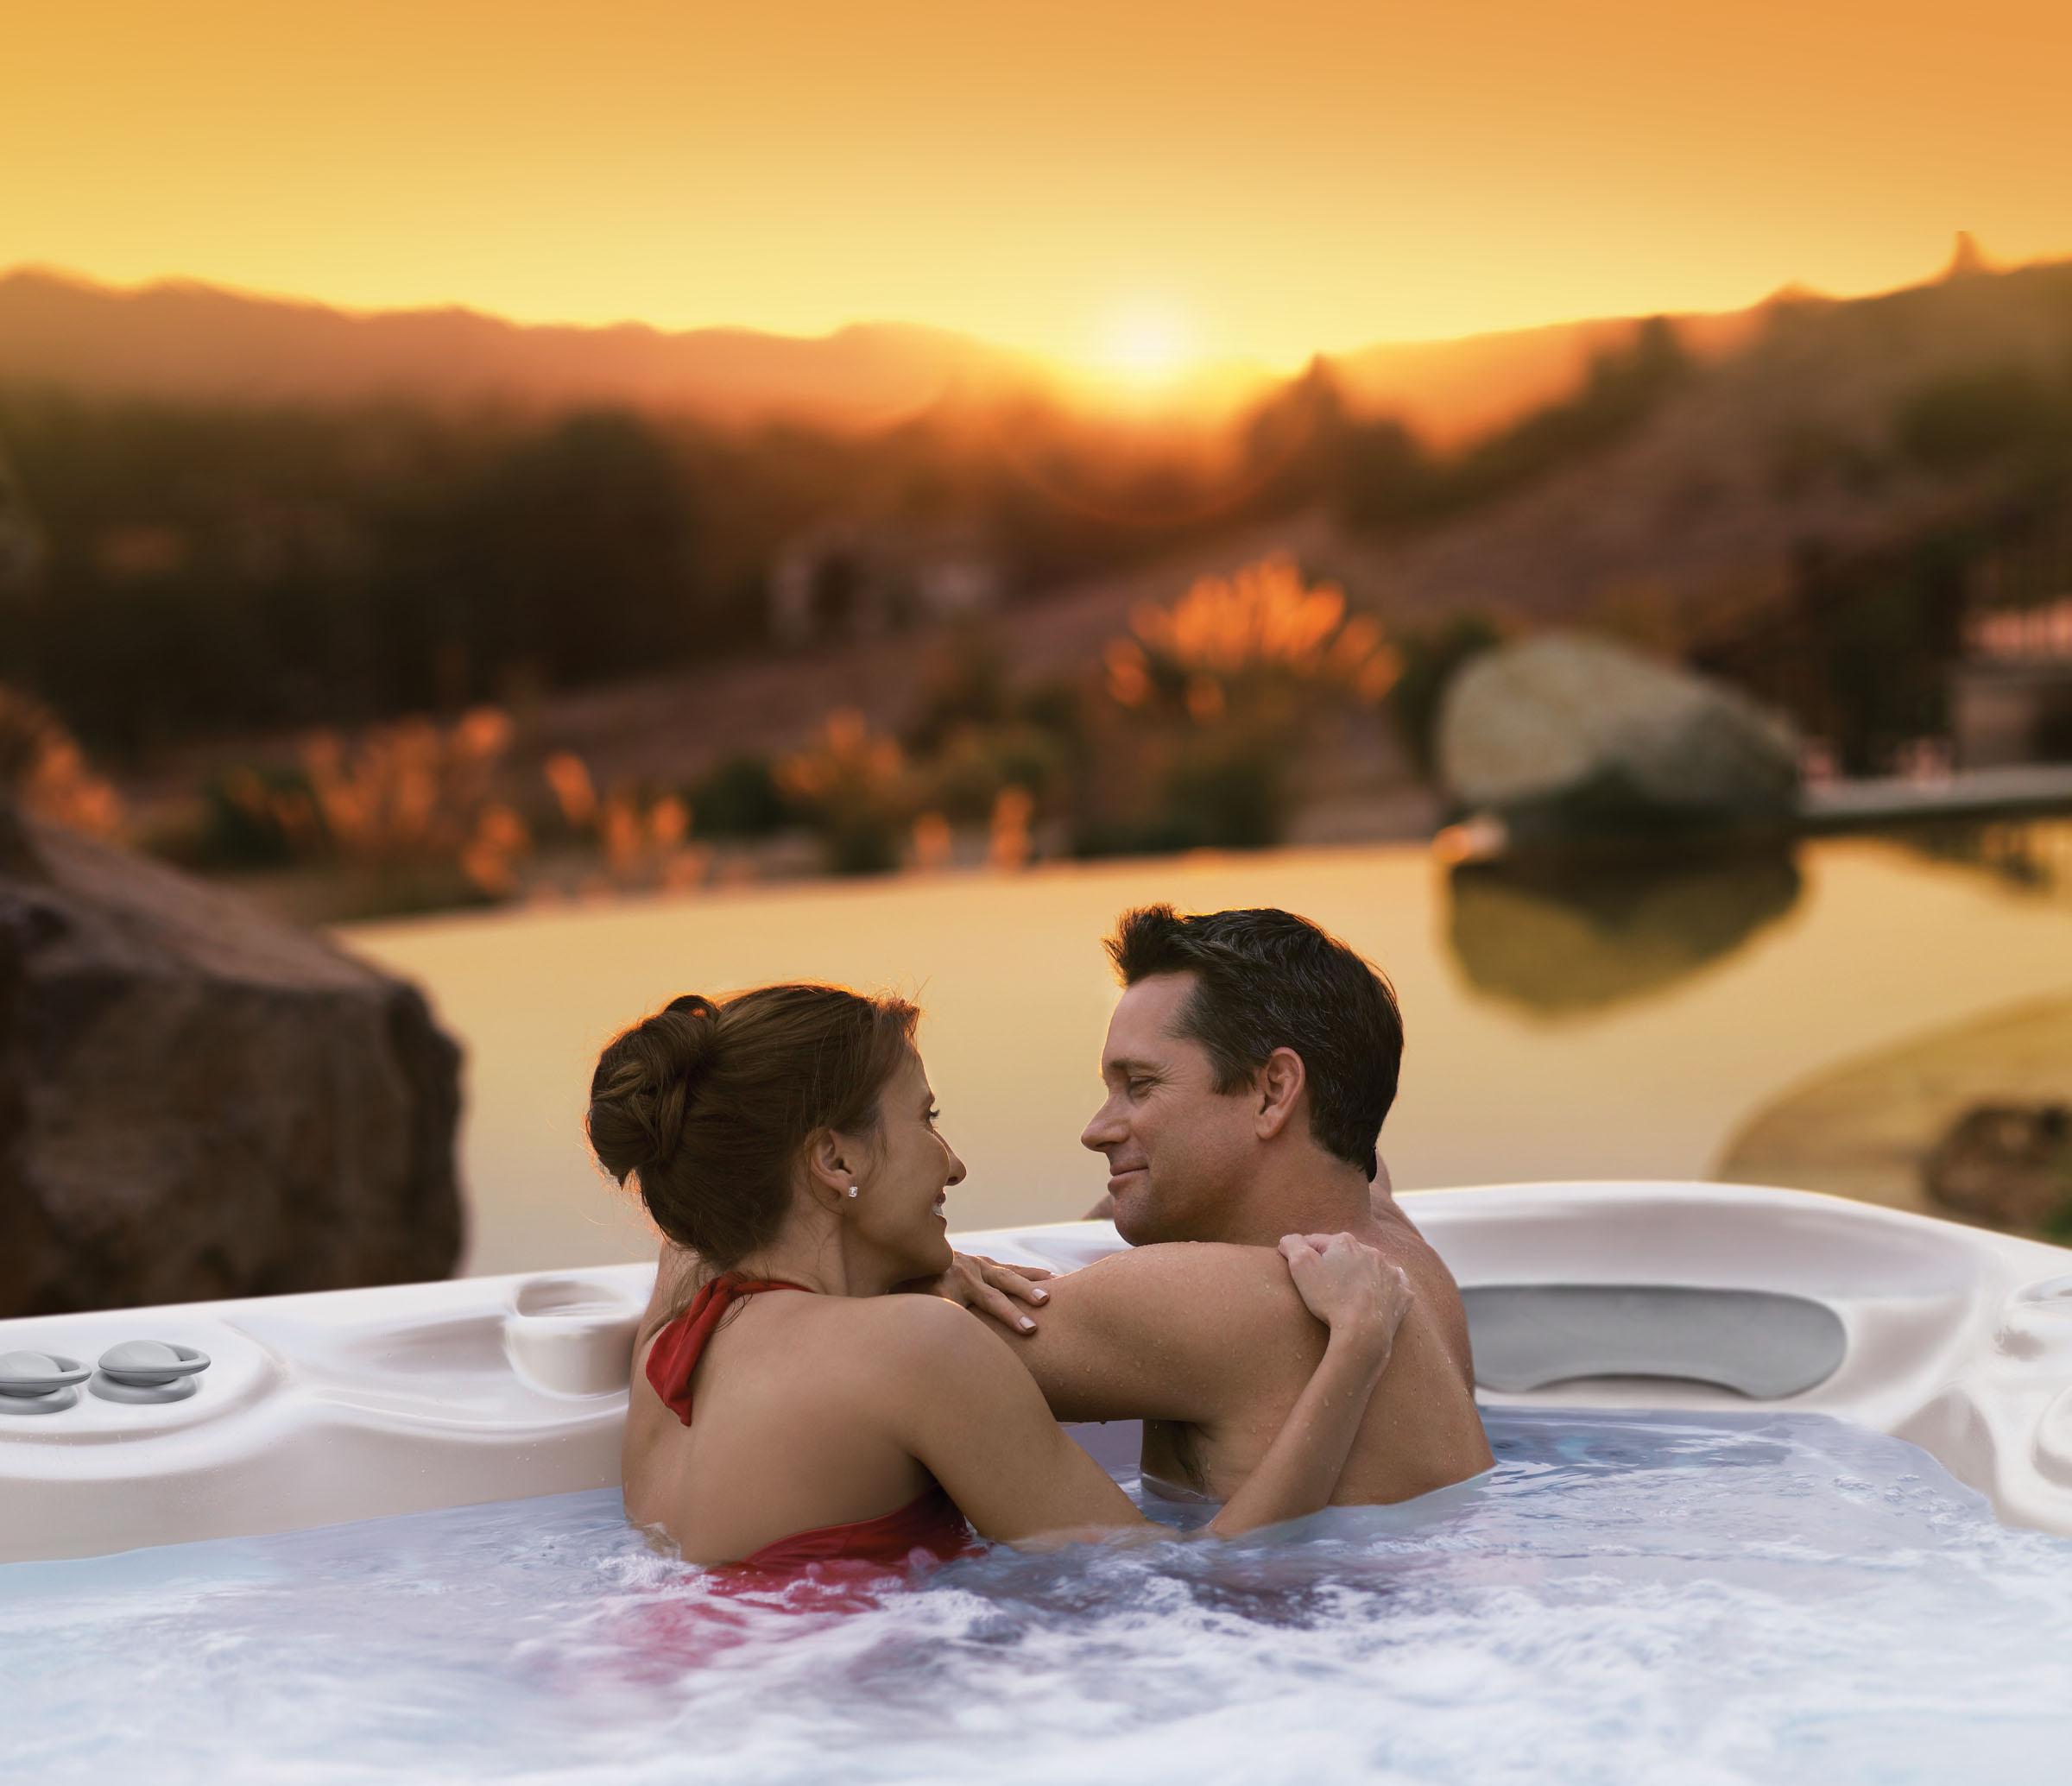 hot-spring-highlife-2012-lifestyle-sunset